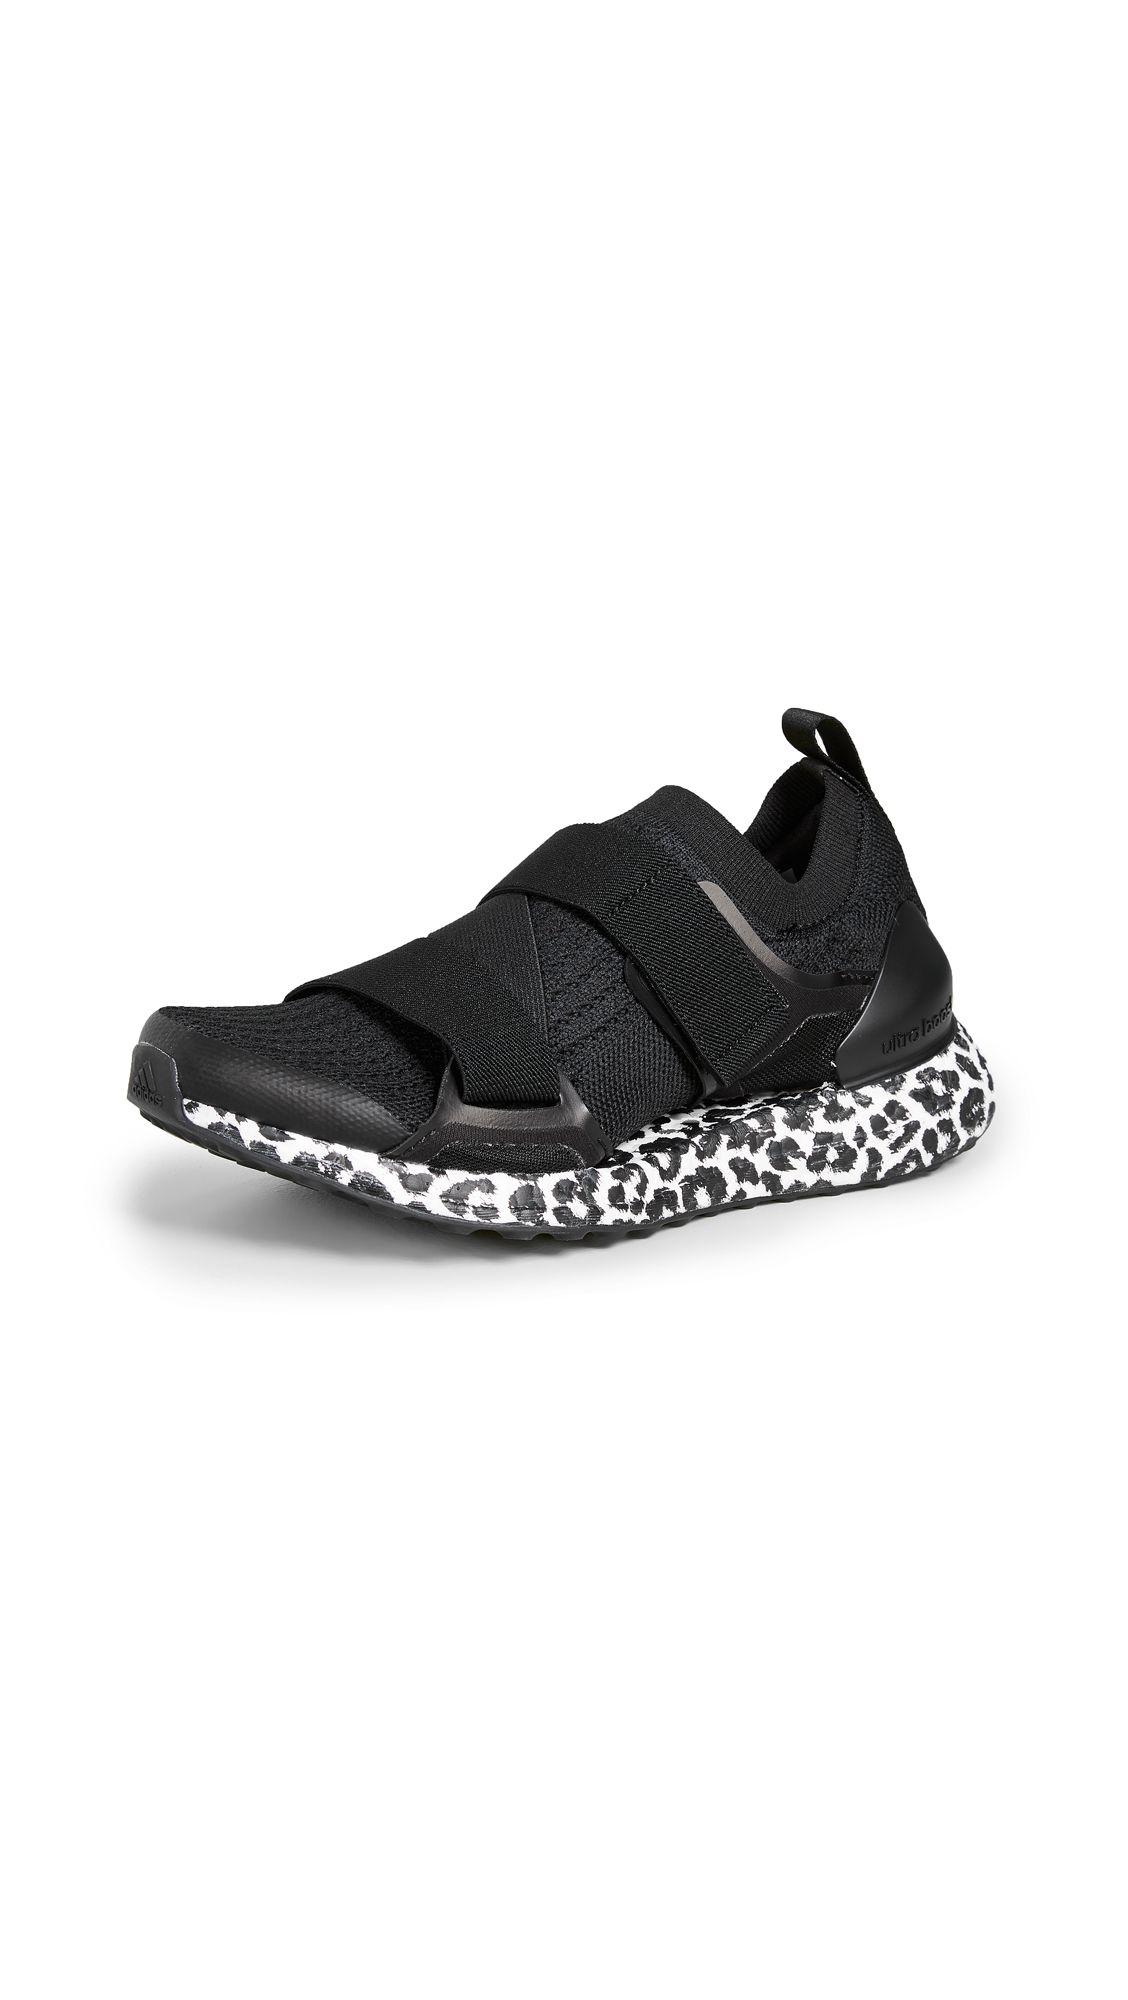 ac440b0e ADIDAS BY STELLA MCCARTNEY ULTRABOOST X SNEAKERS. #adidasbystellamccartney  #shoes #